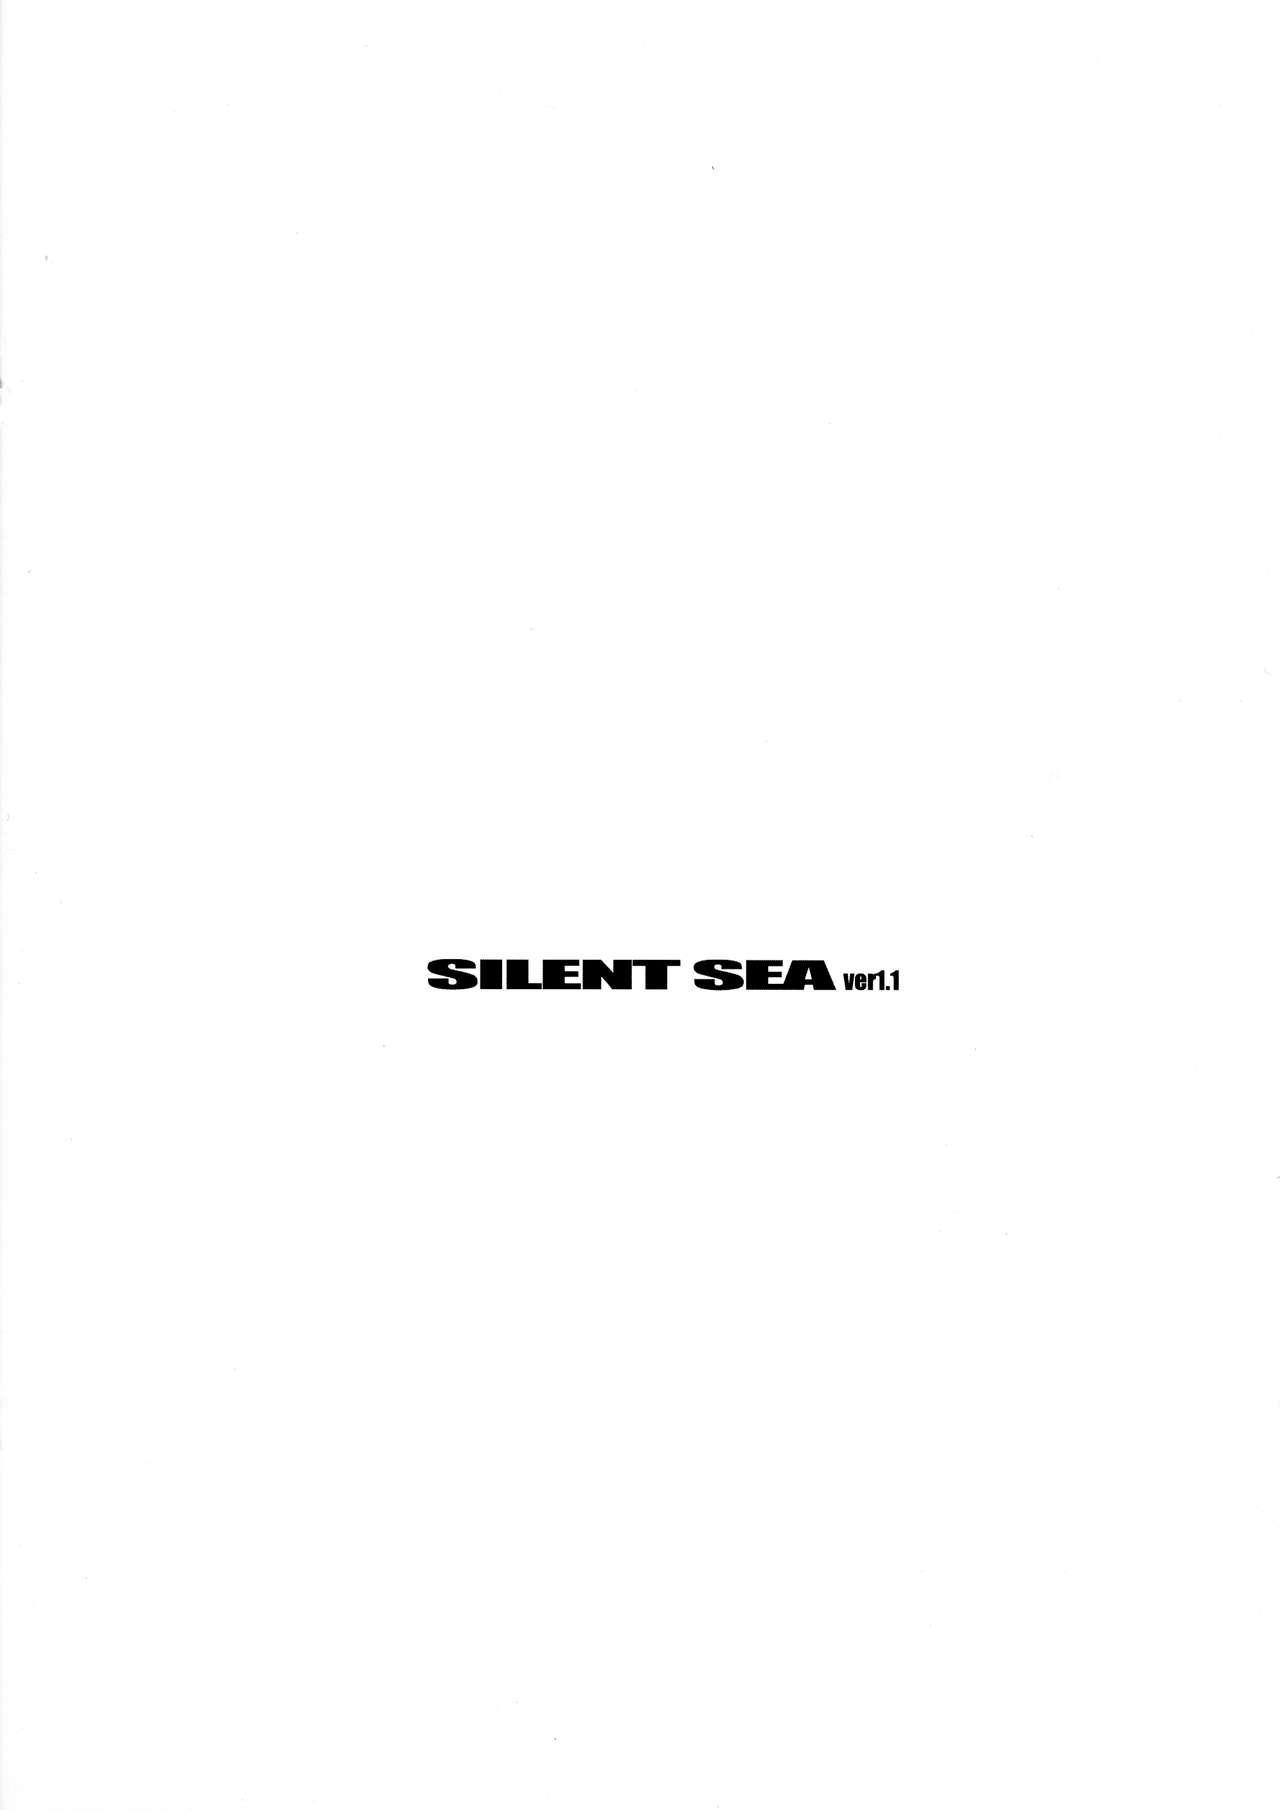 SILENT SEA vol.1.1 1